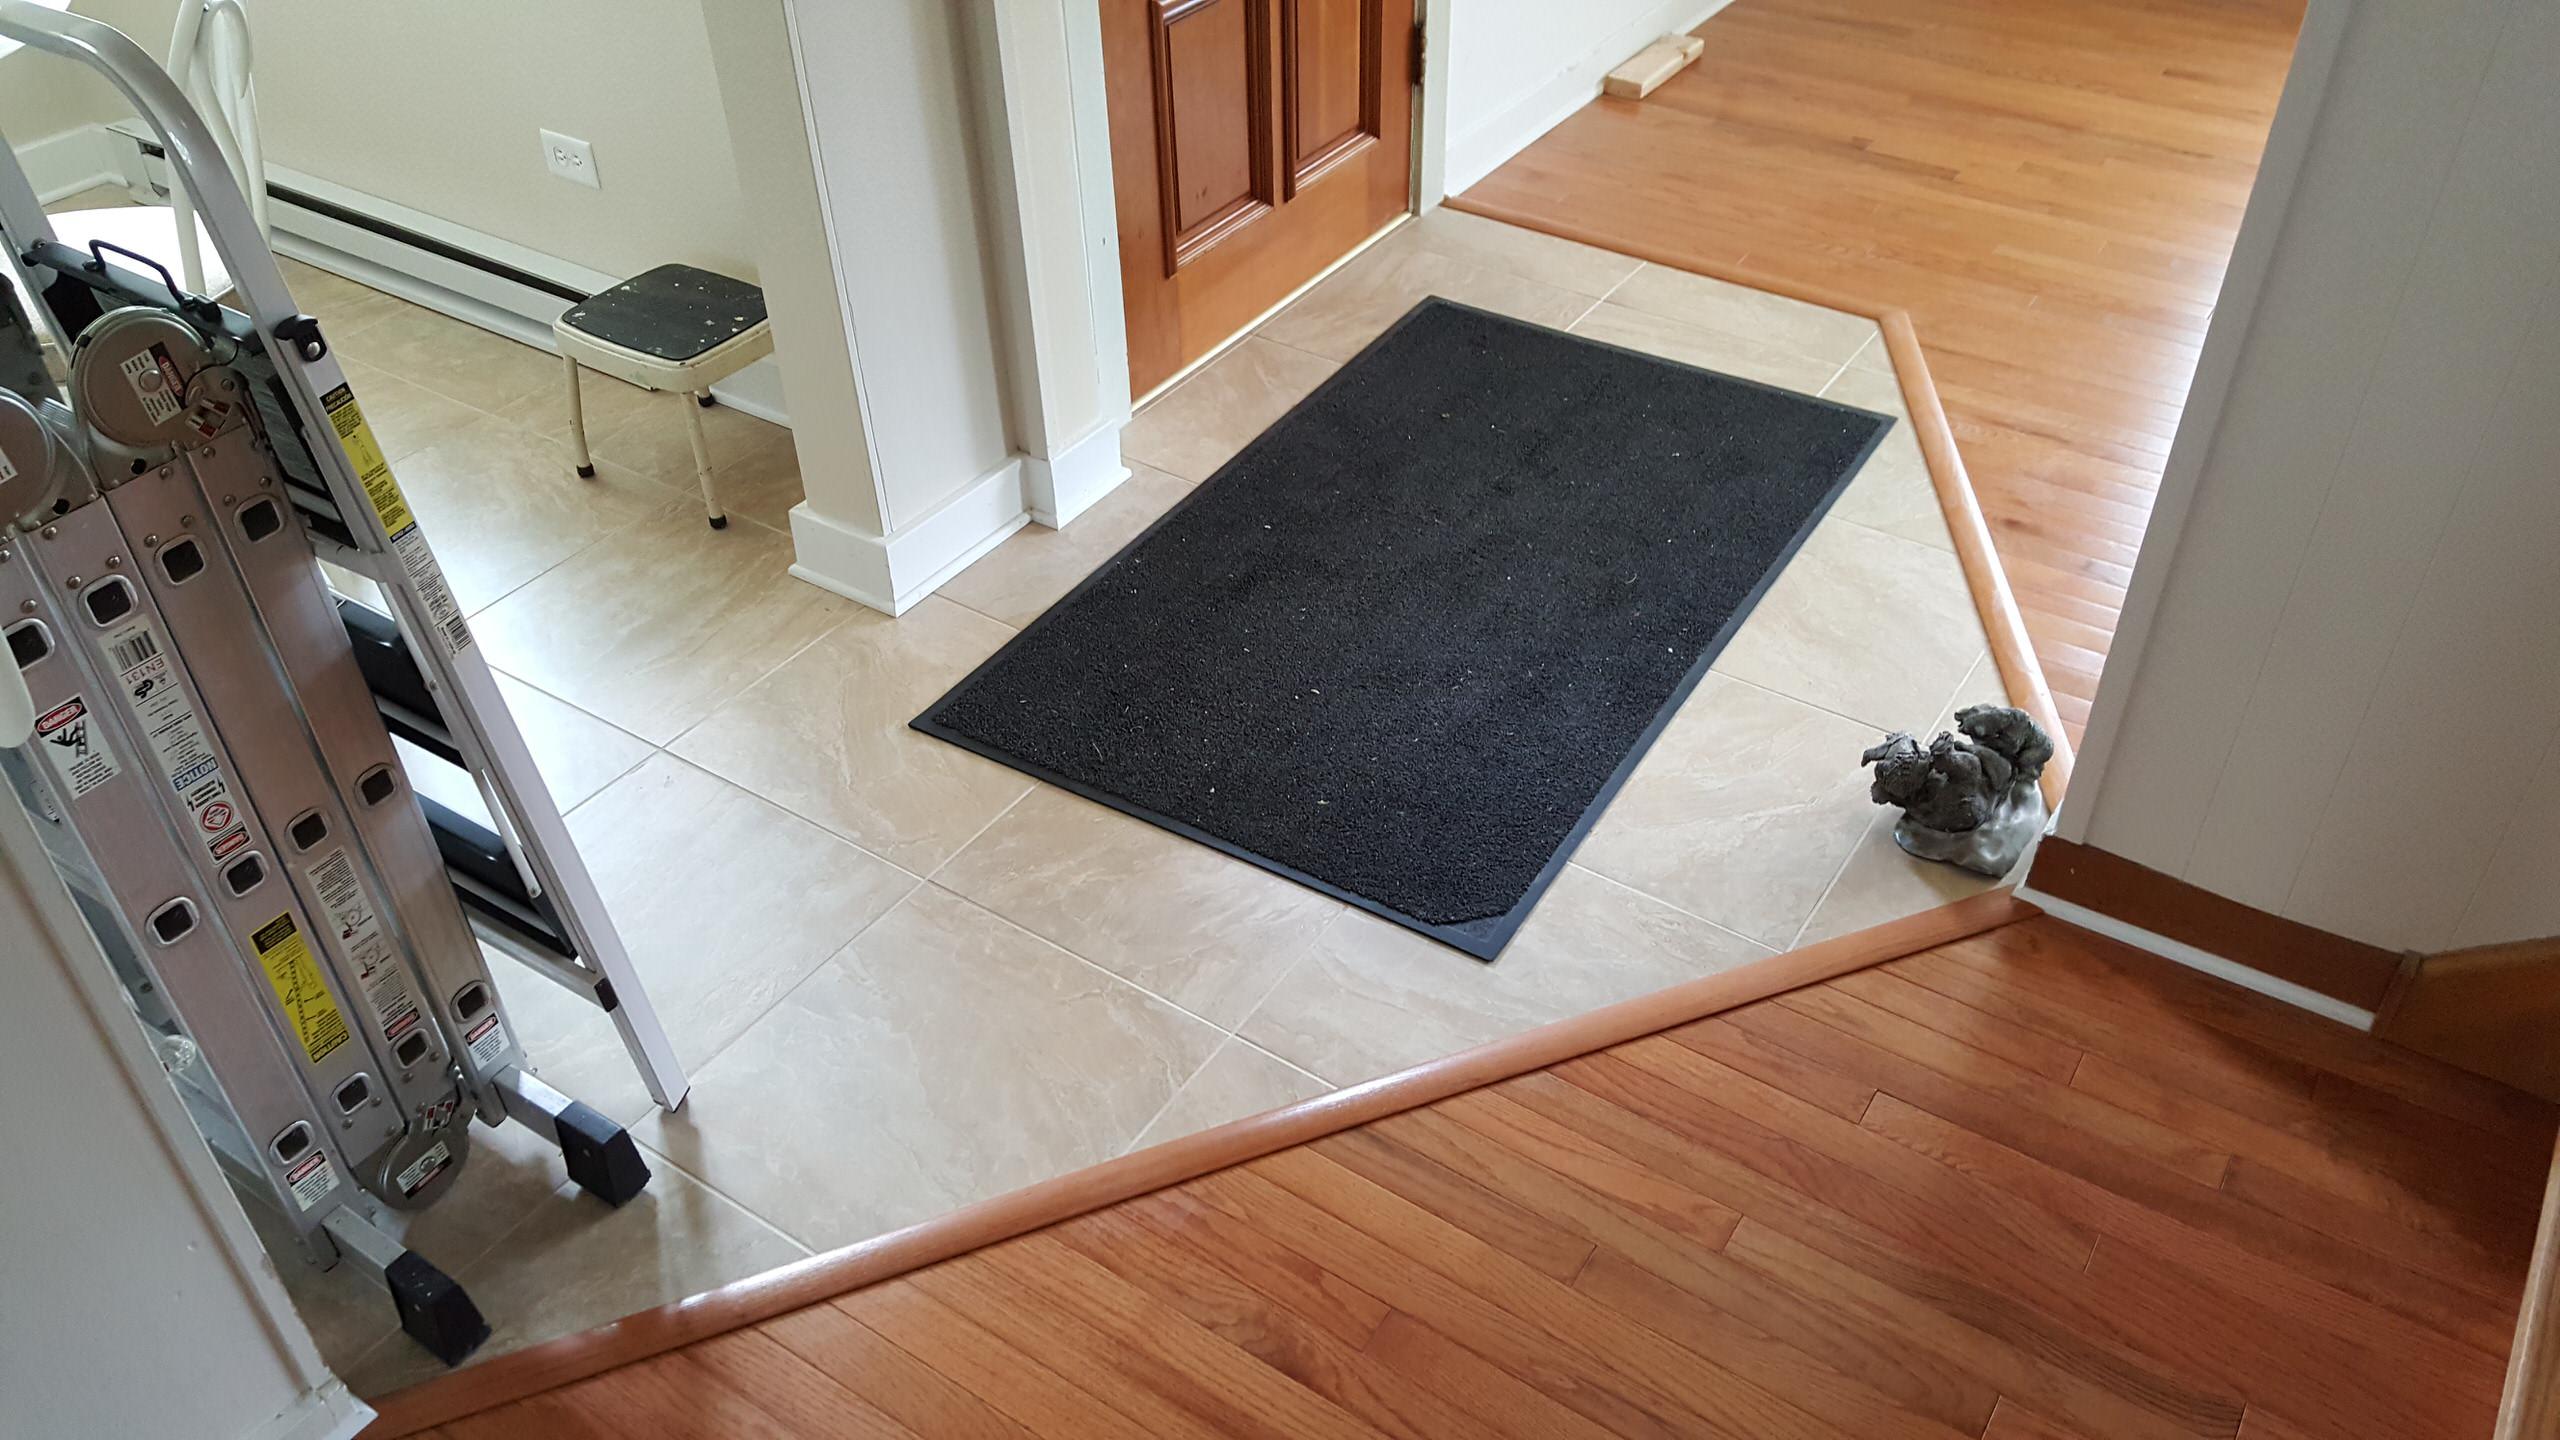 New tile and hardwood